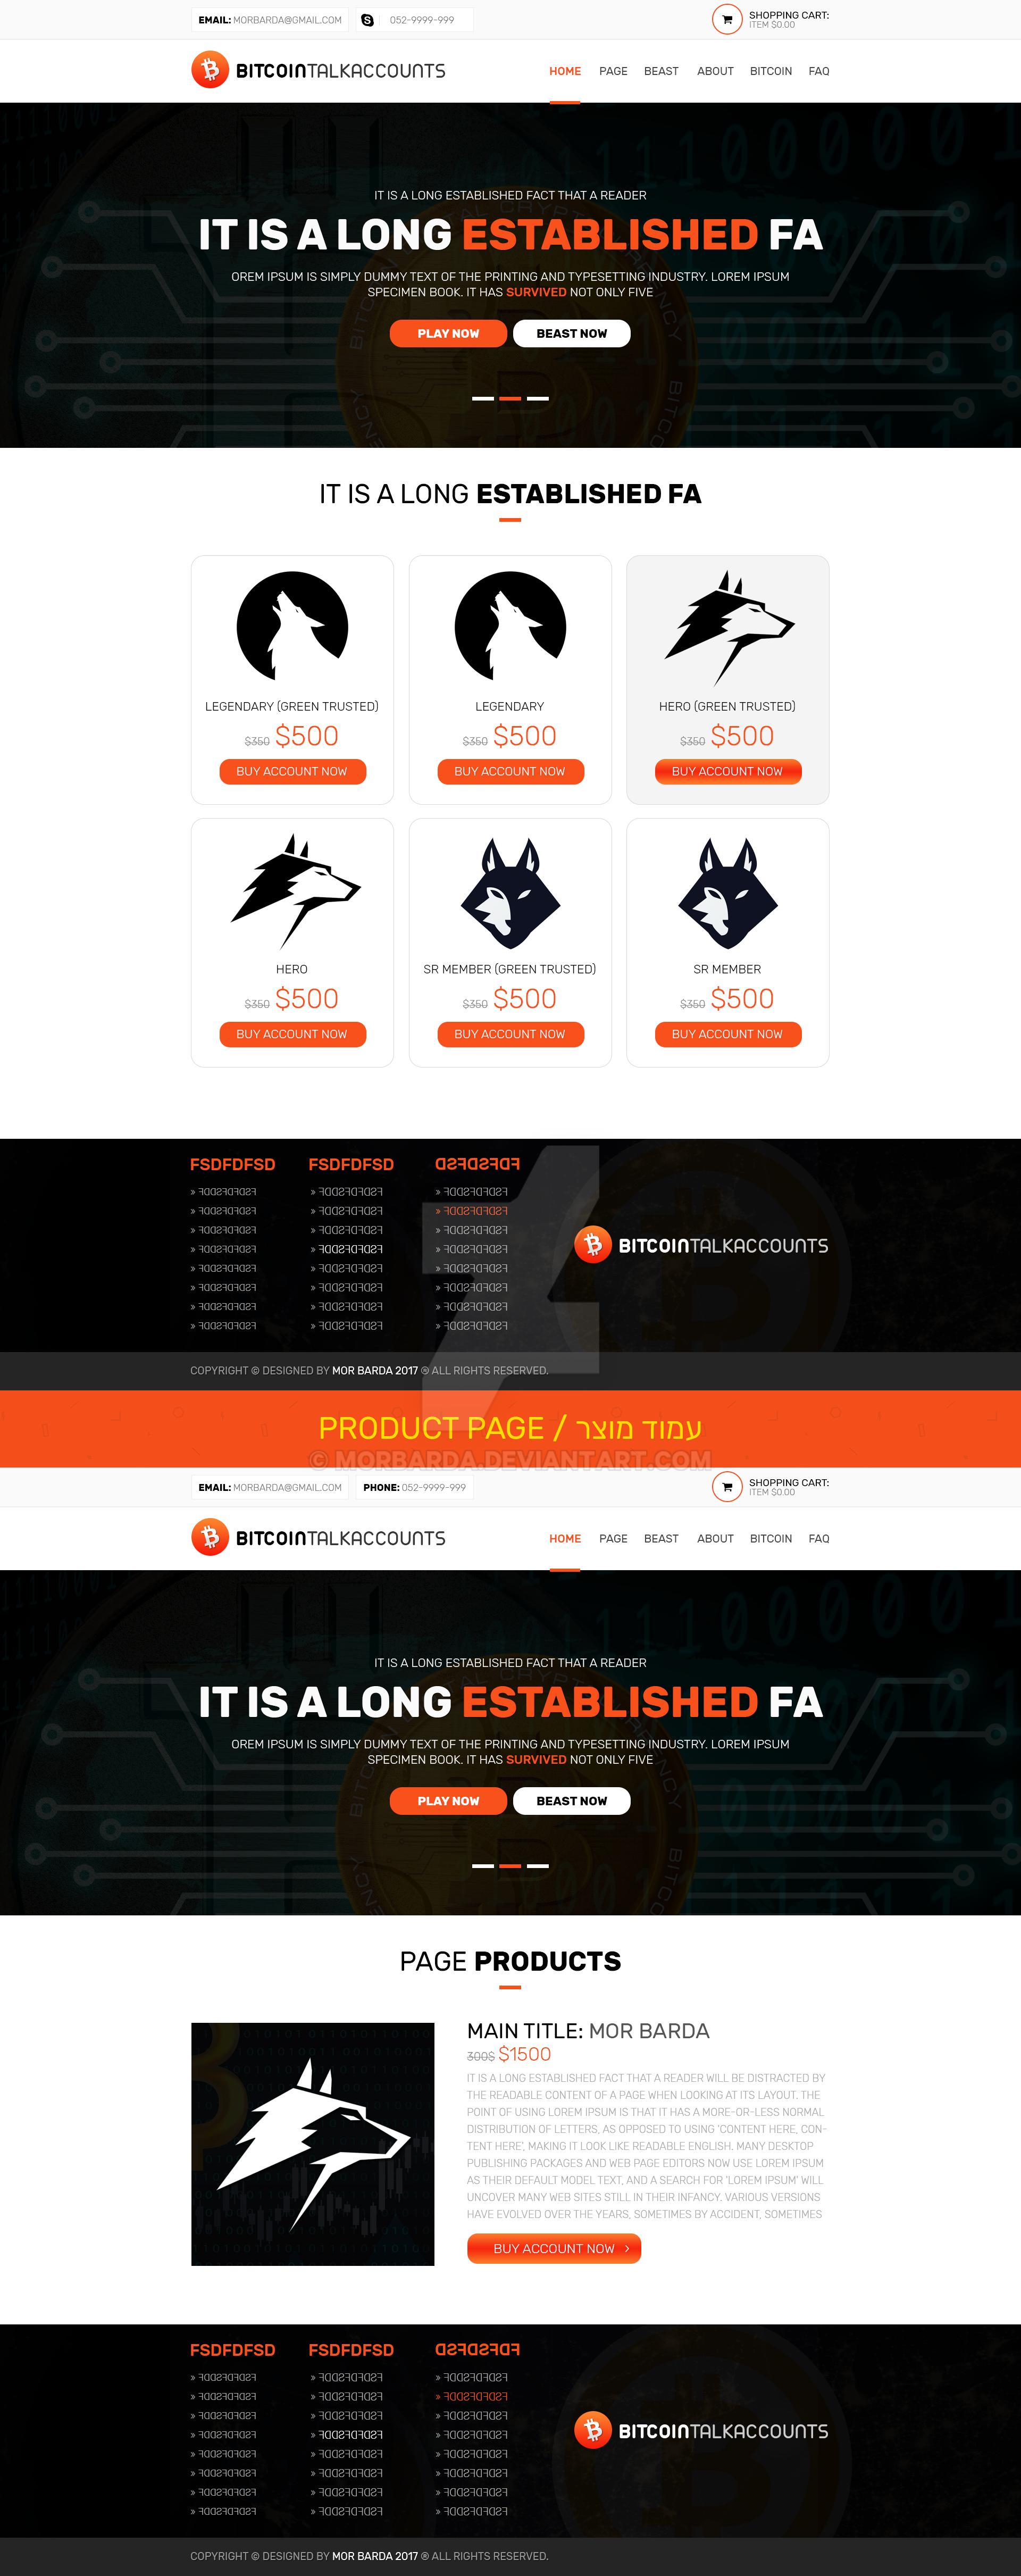 Website Design - Bitcointalkaccounts - SOLD by MorBarda